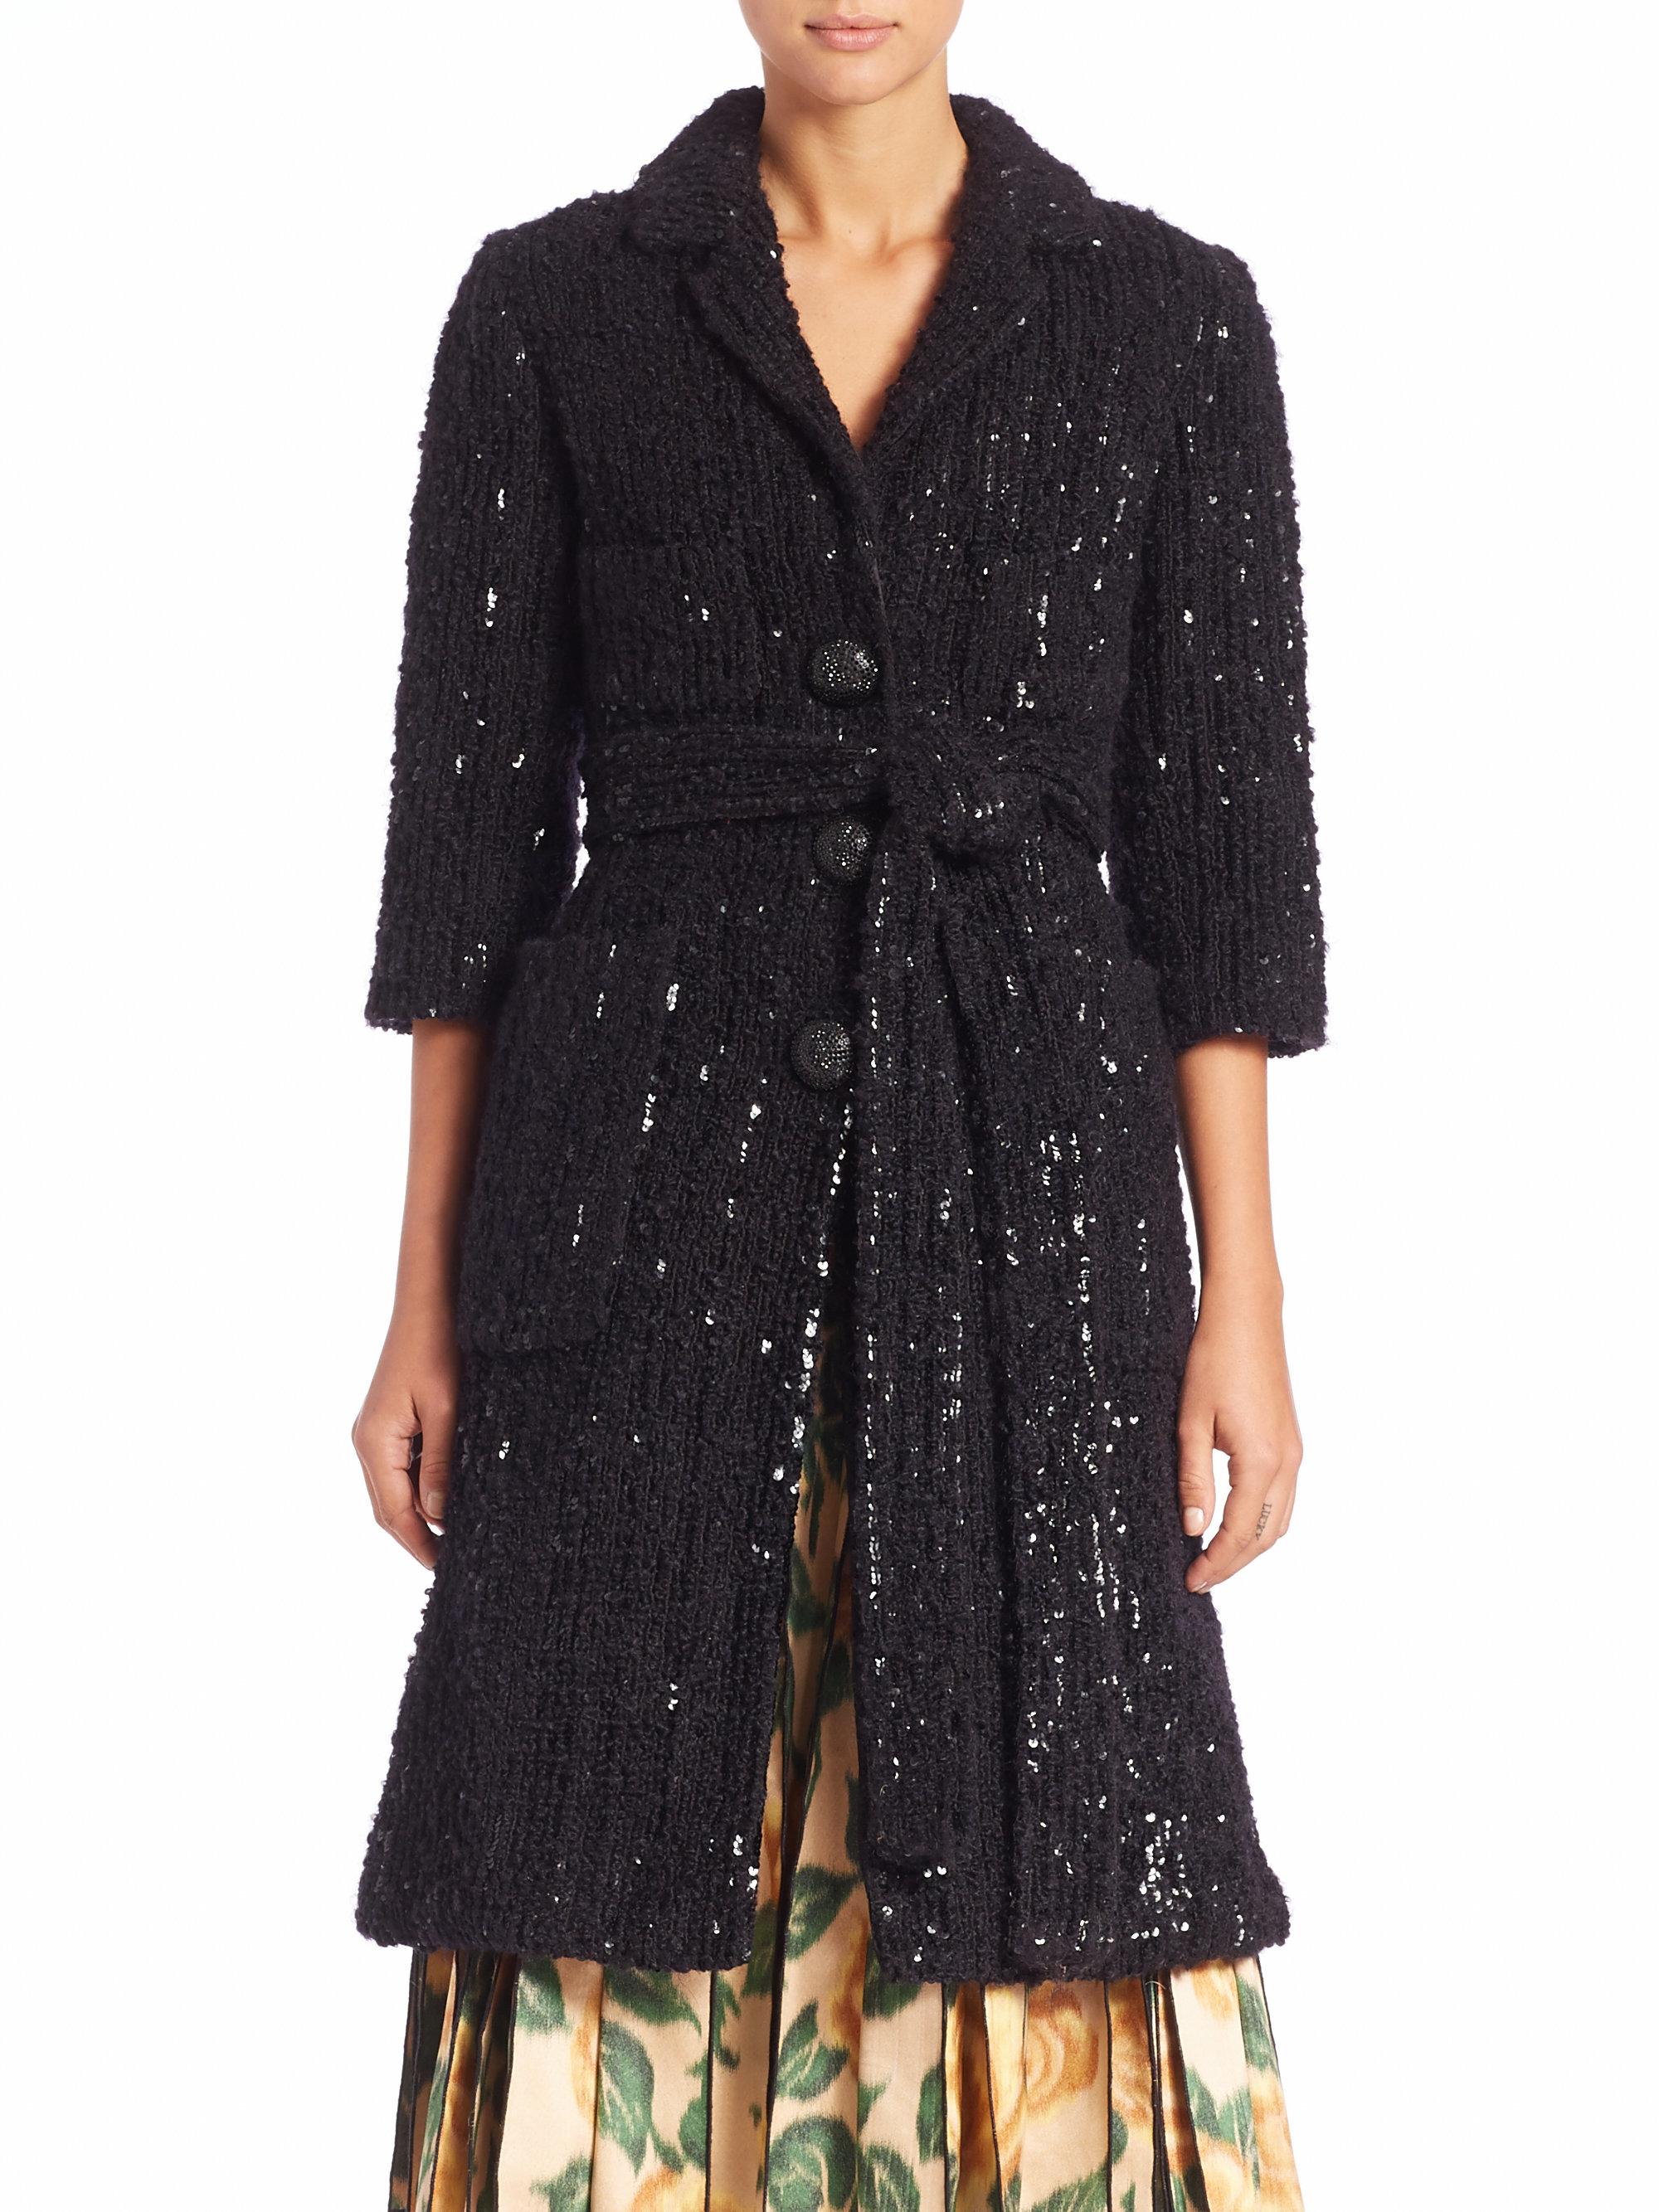 Lyst Marc Jacobs Sequined Tweed Coat In Black